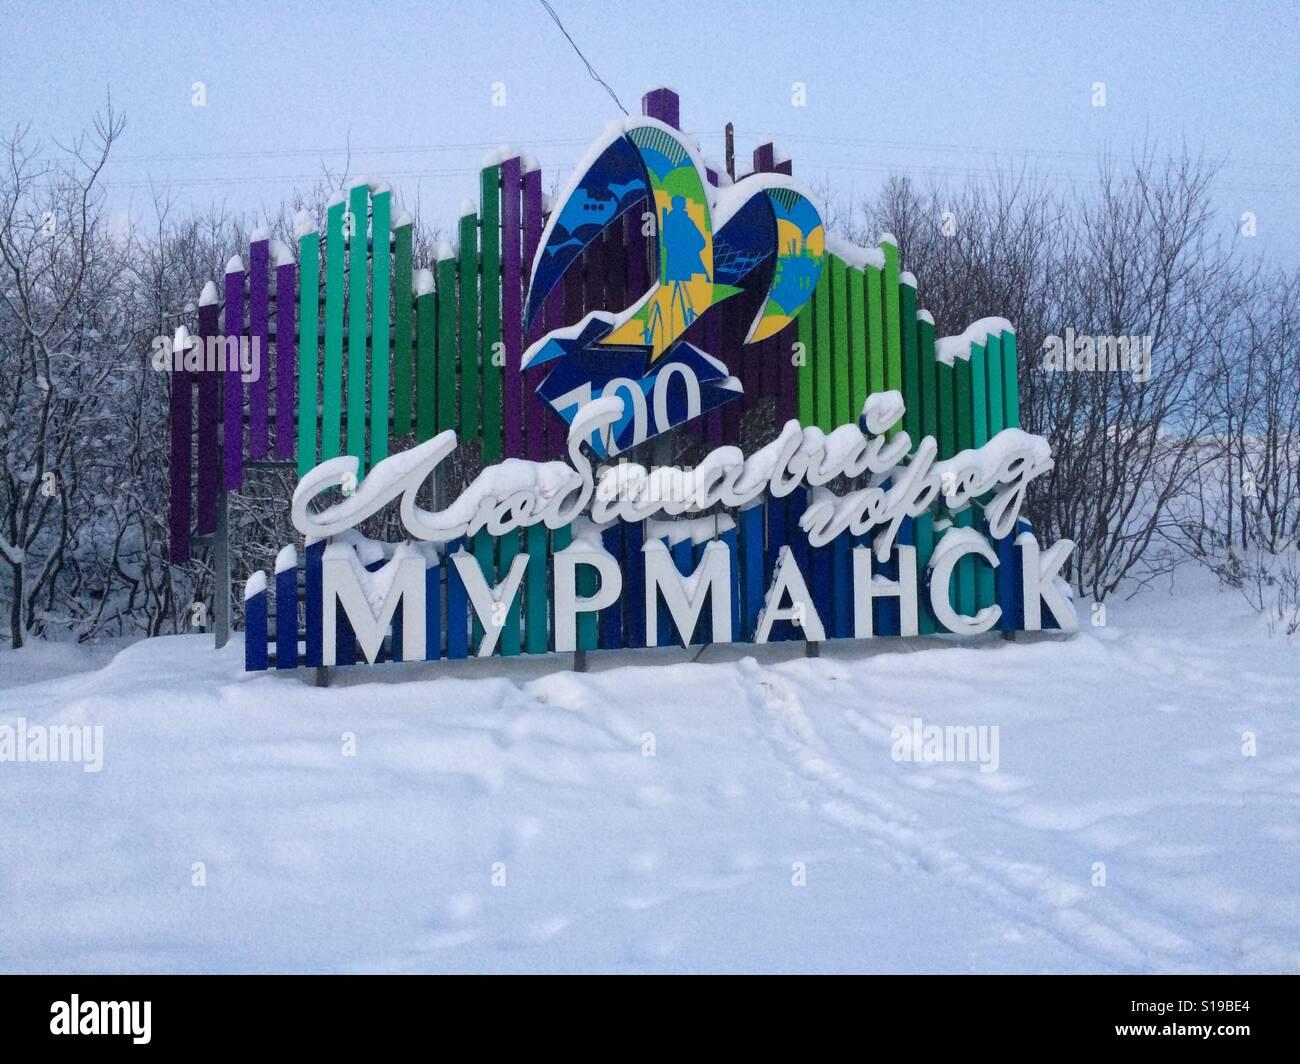 Murmansk Sign - Stock Image